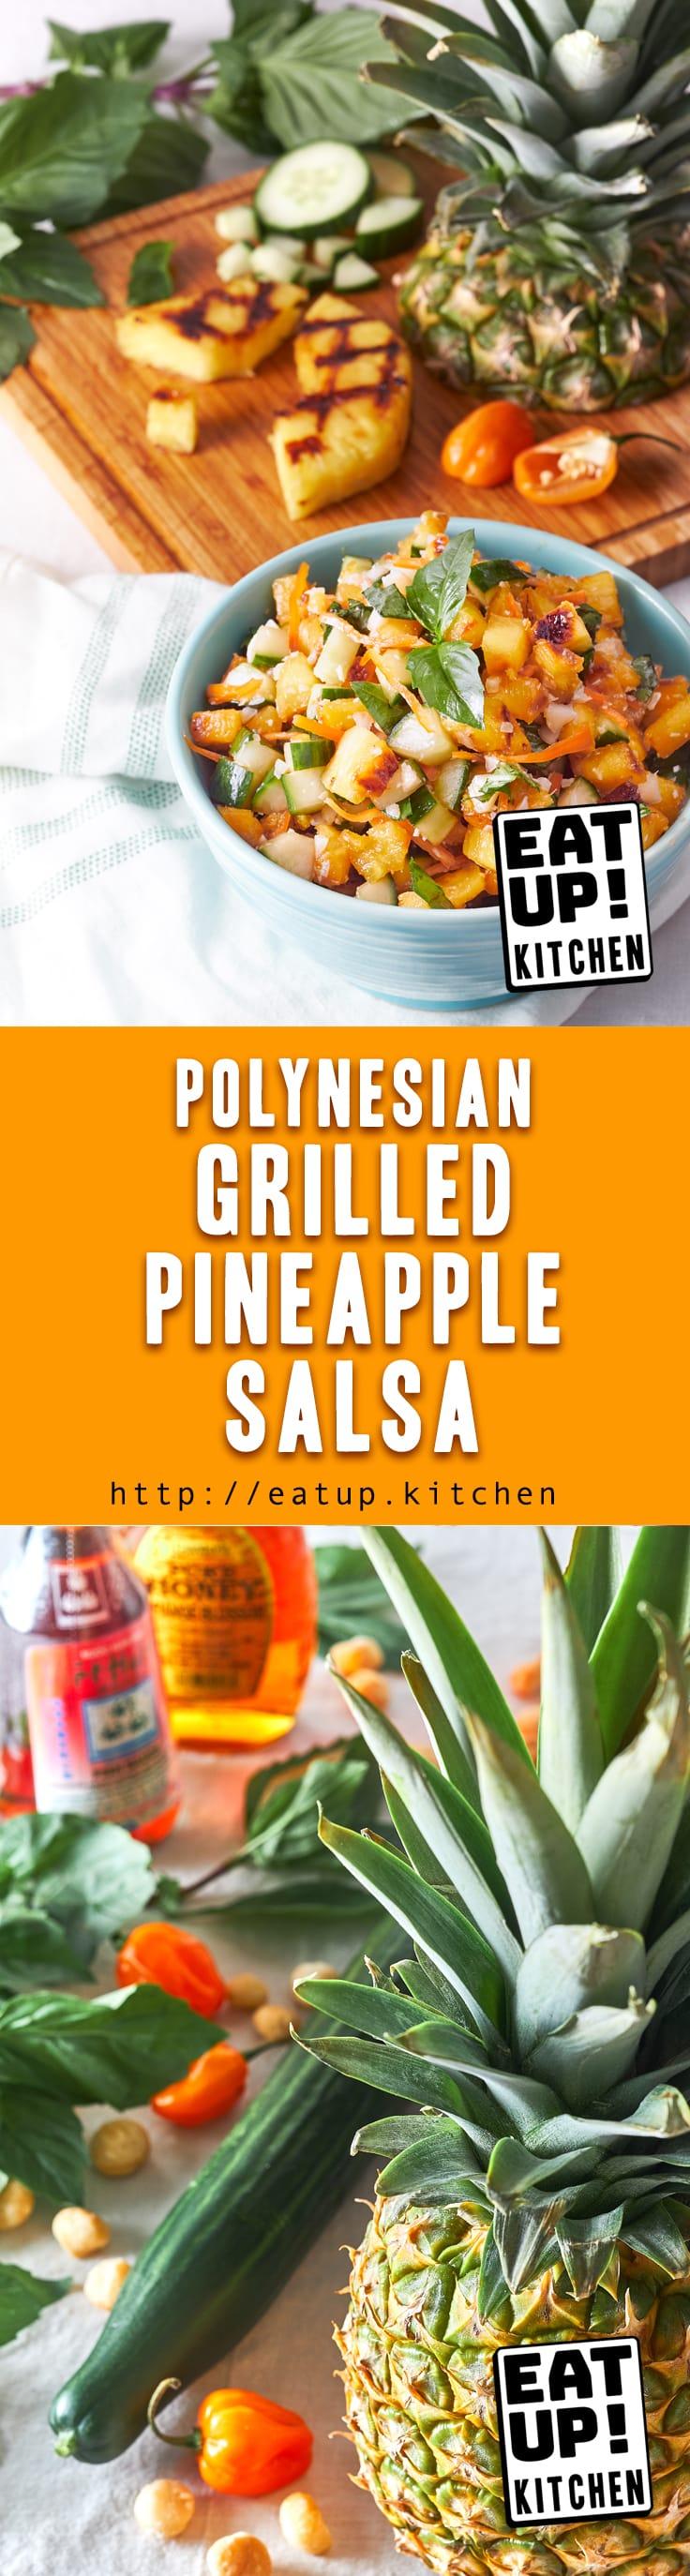 Polynesian Grilled Pineapple Salsa